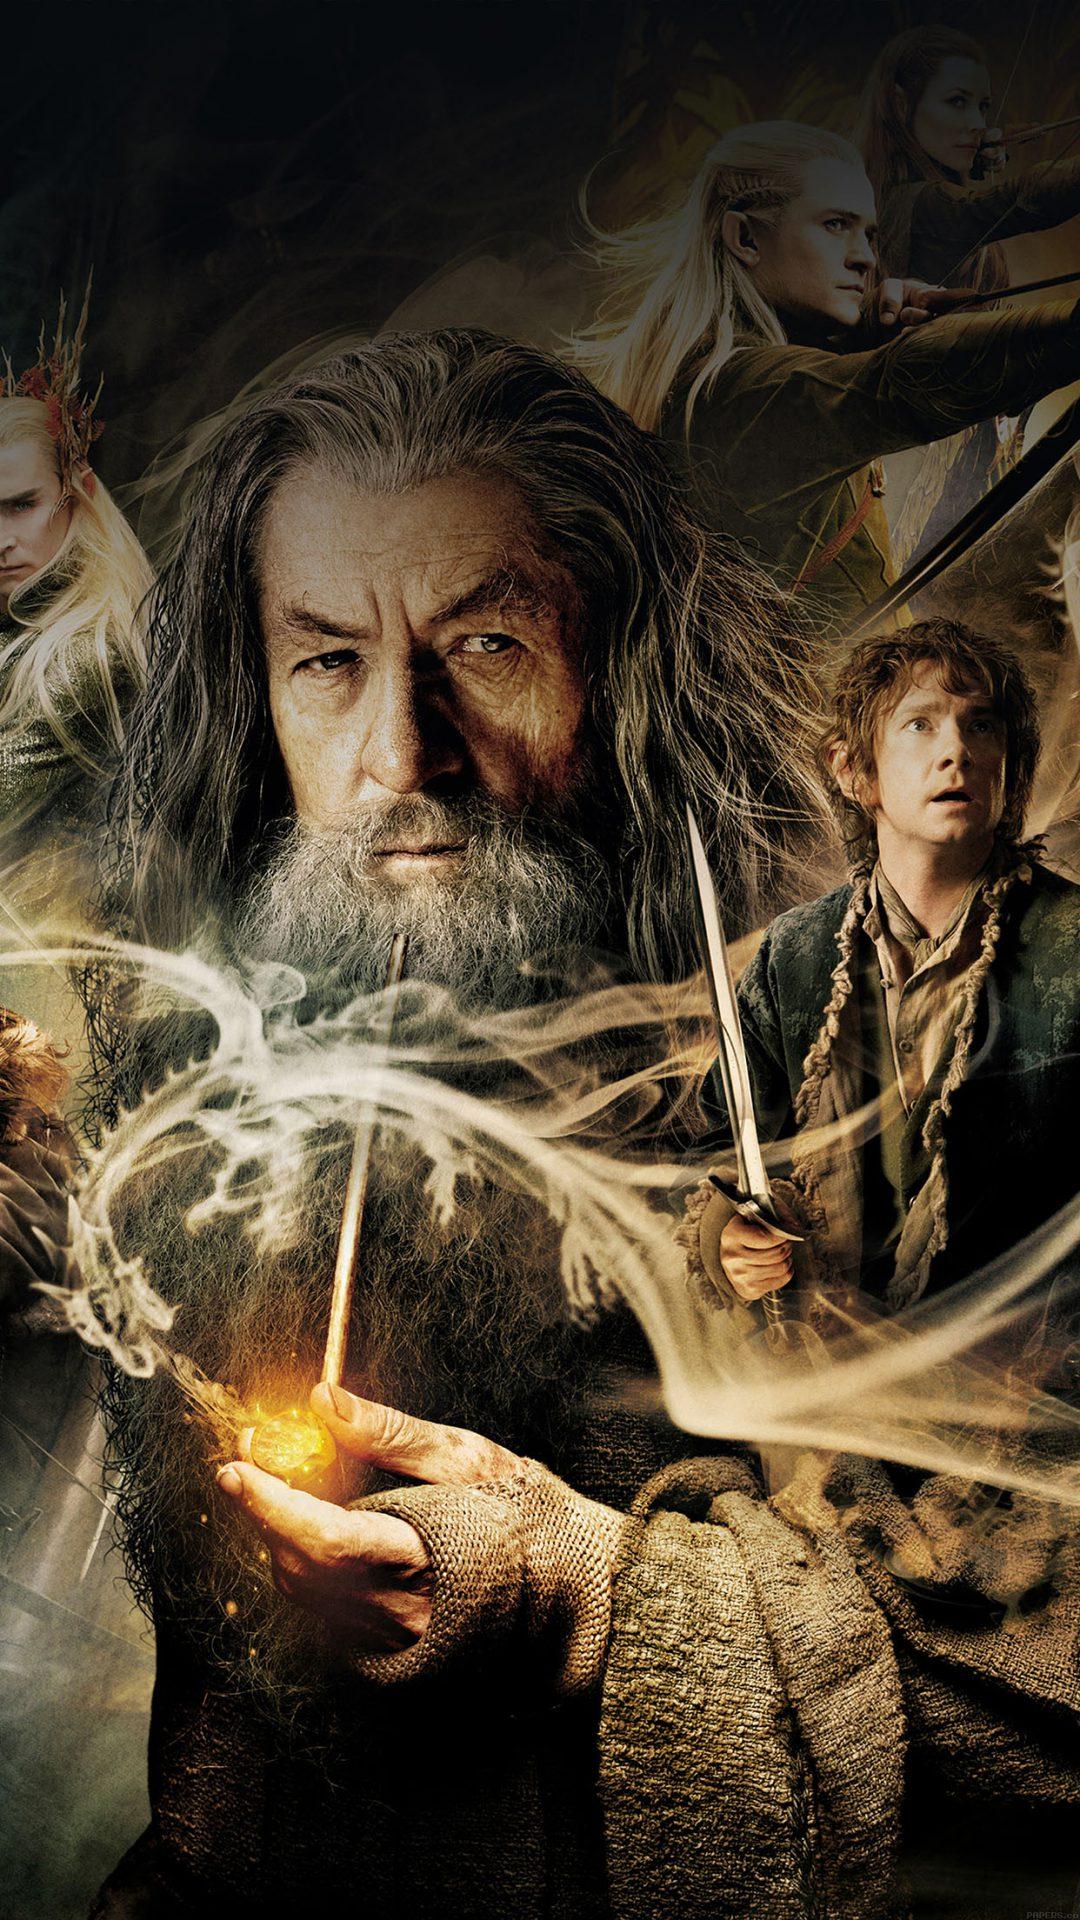 Wallpaper Desolation Of Smaug Hobbit Film Face